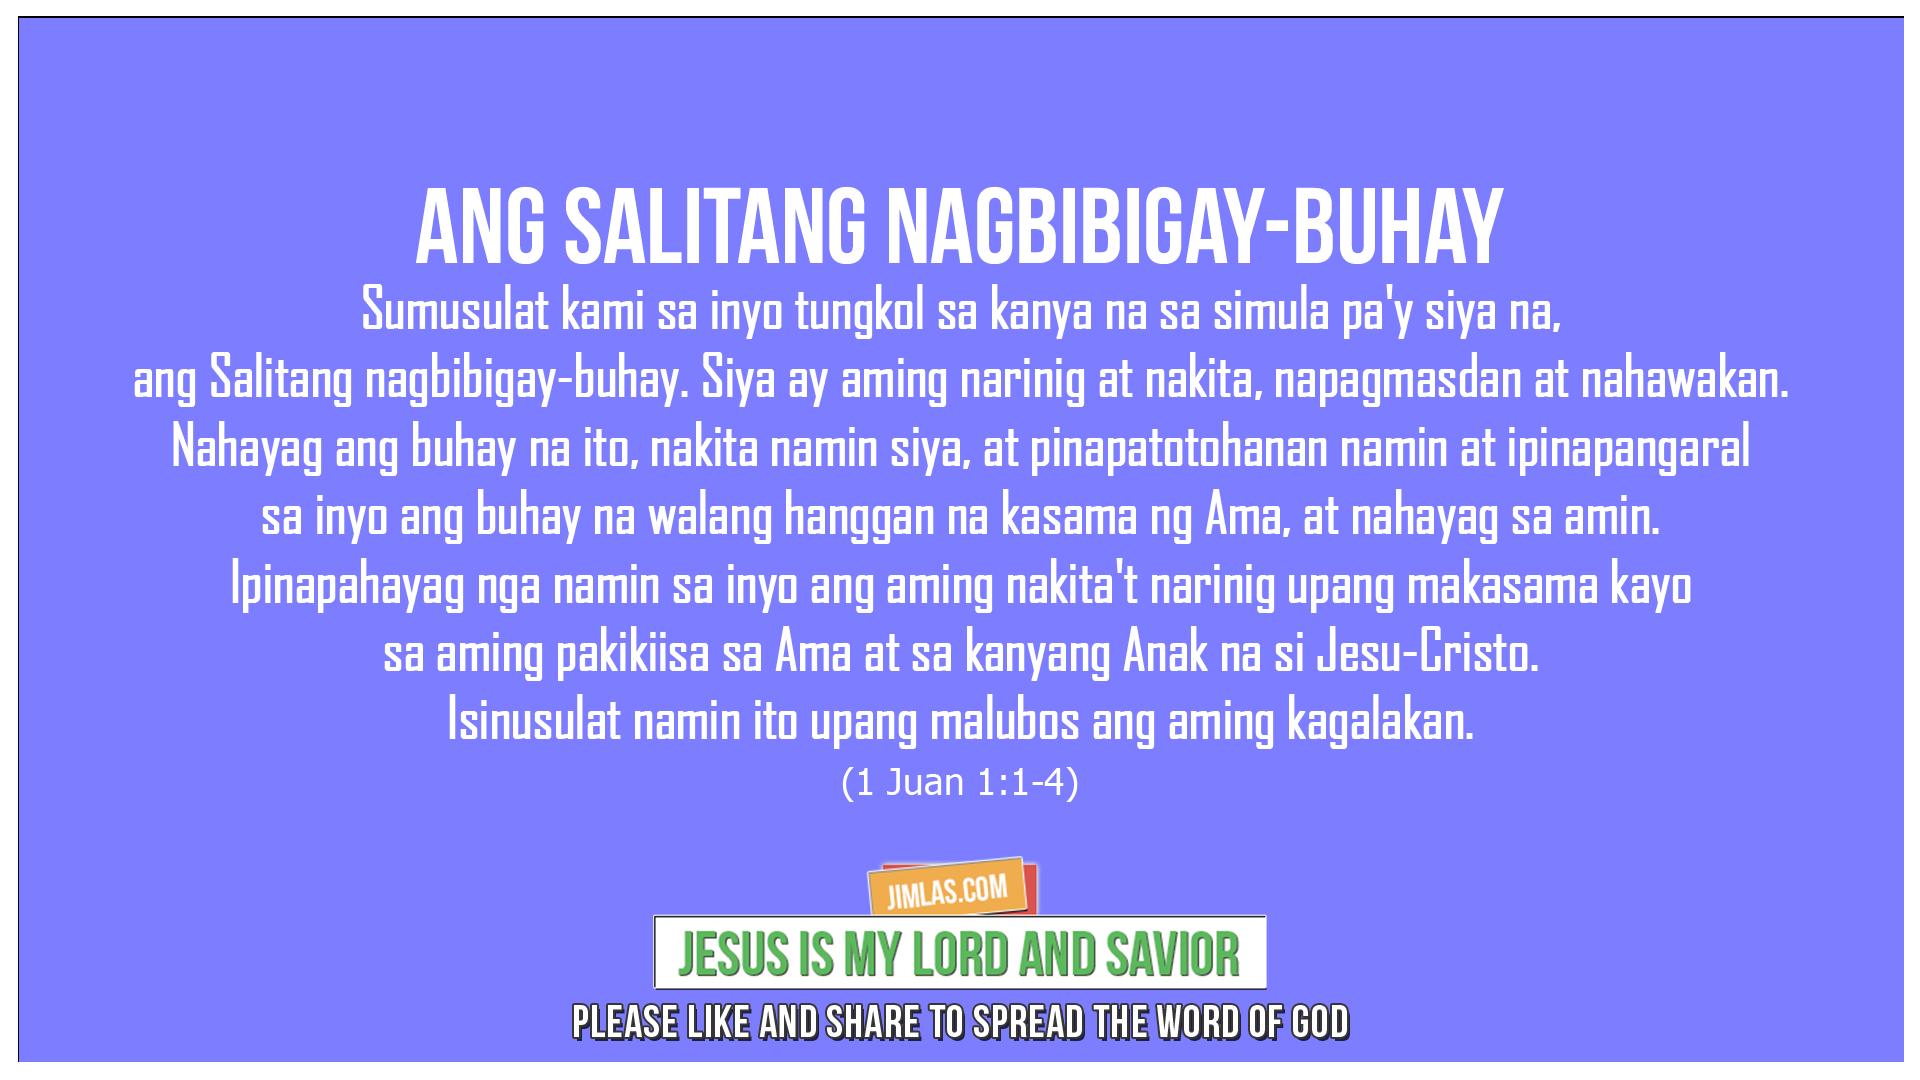 1 Juan 1:1-4, 1 Juan 1:1-4